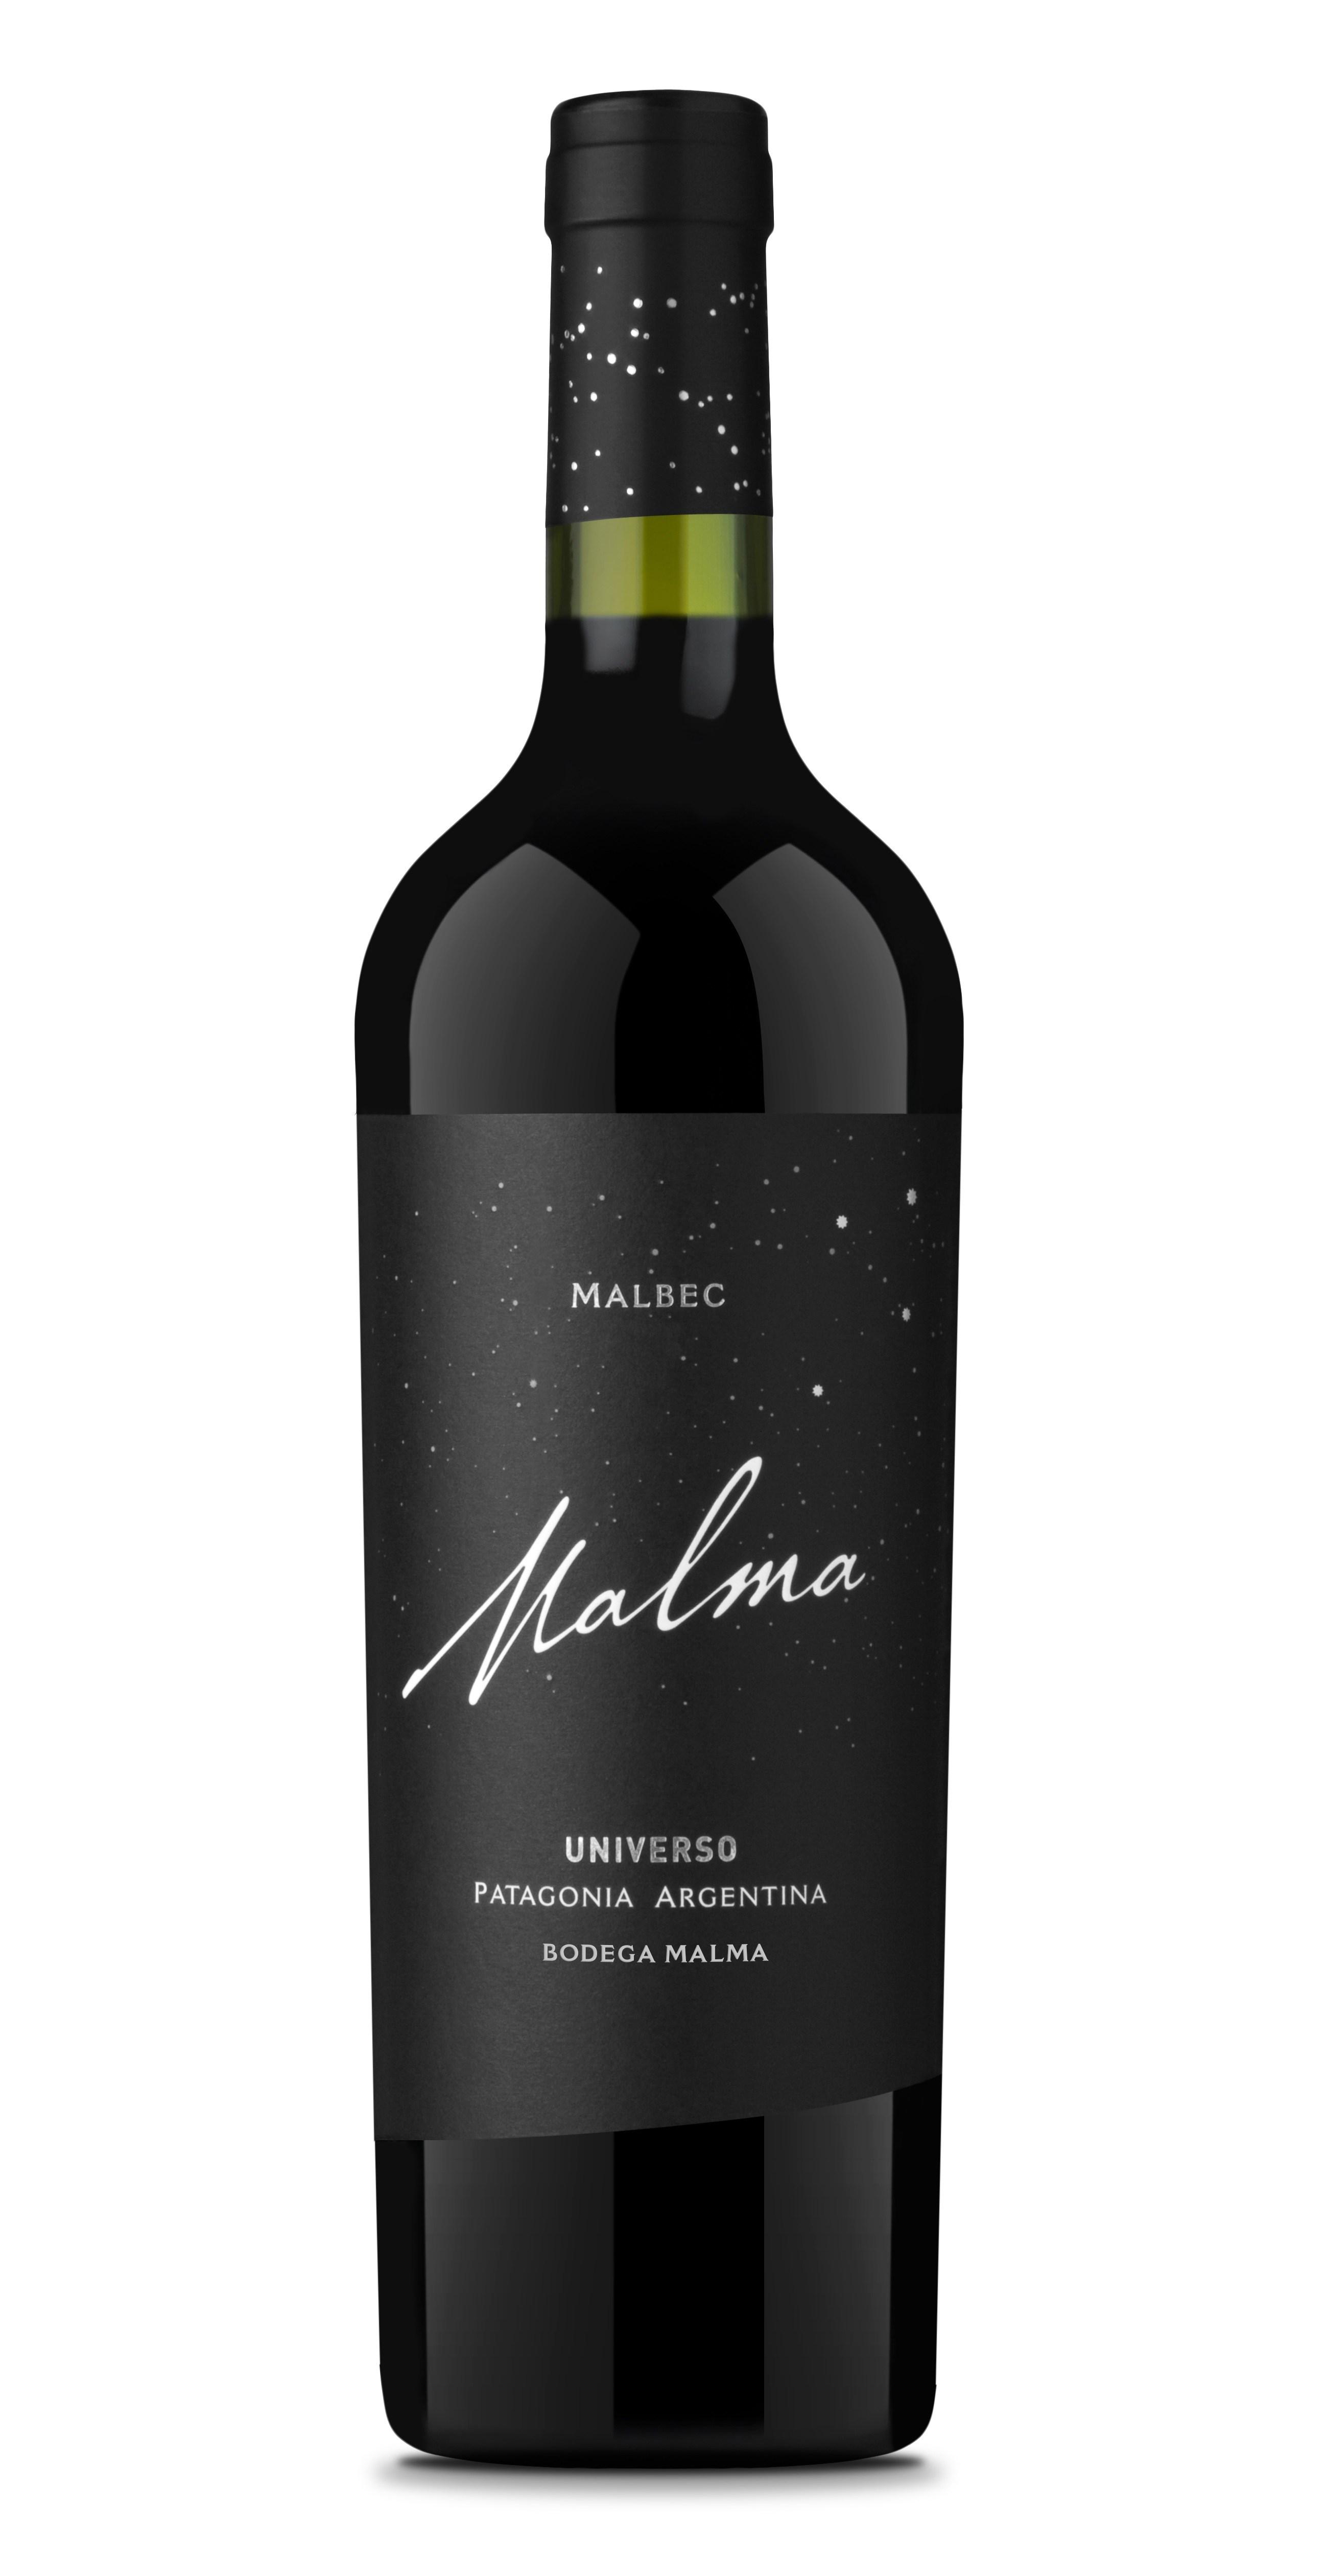 Malma Universo Malbec 2011